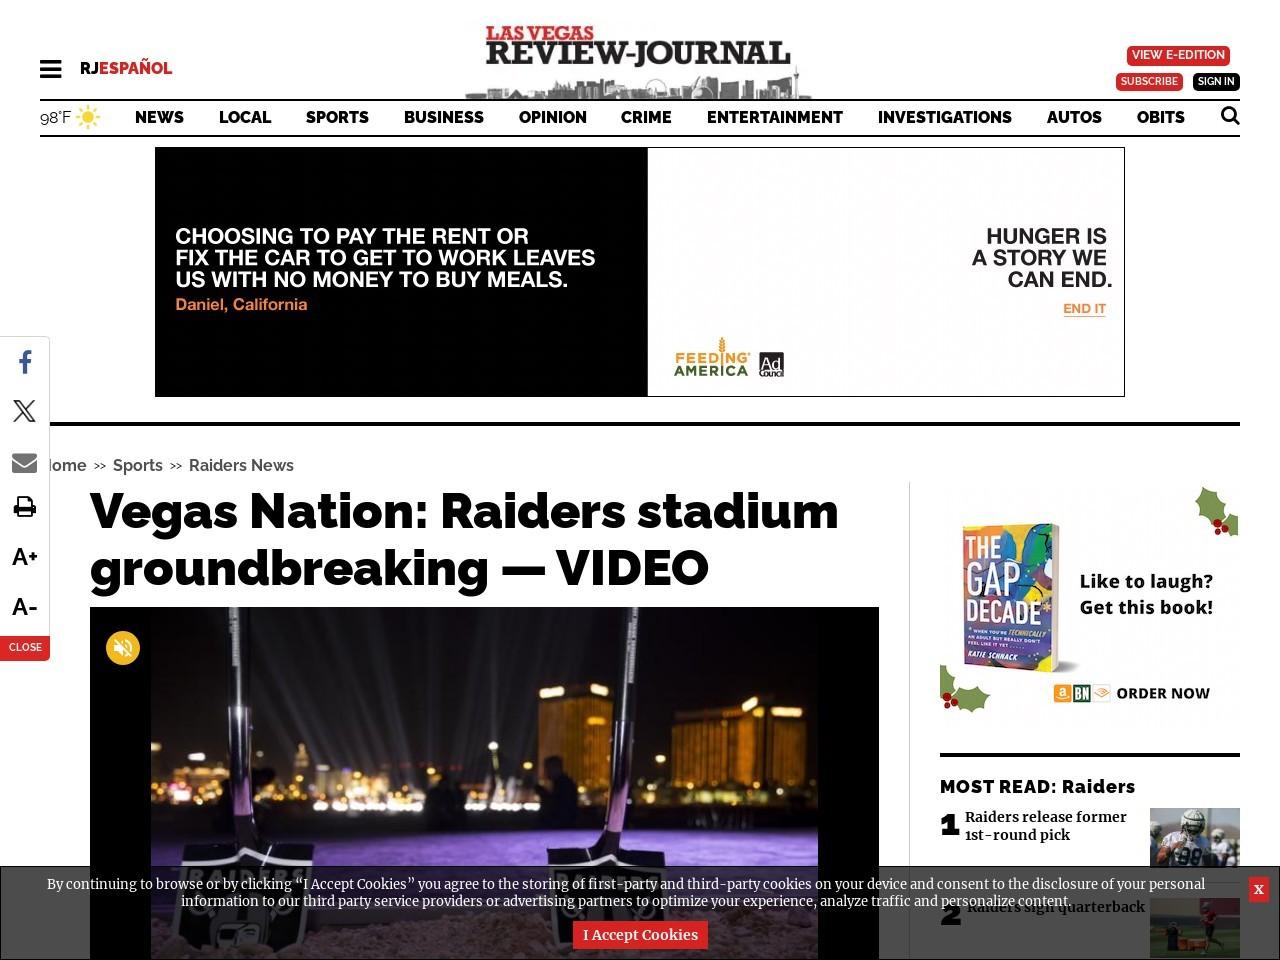 Vegas Nation: Raiders stadium groundbreaking — VIDEO